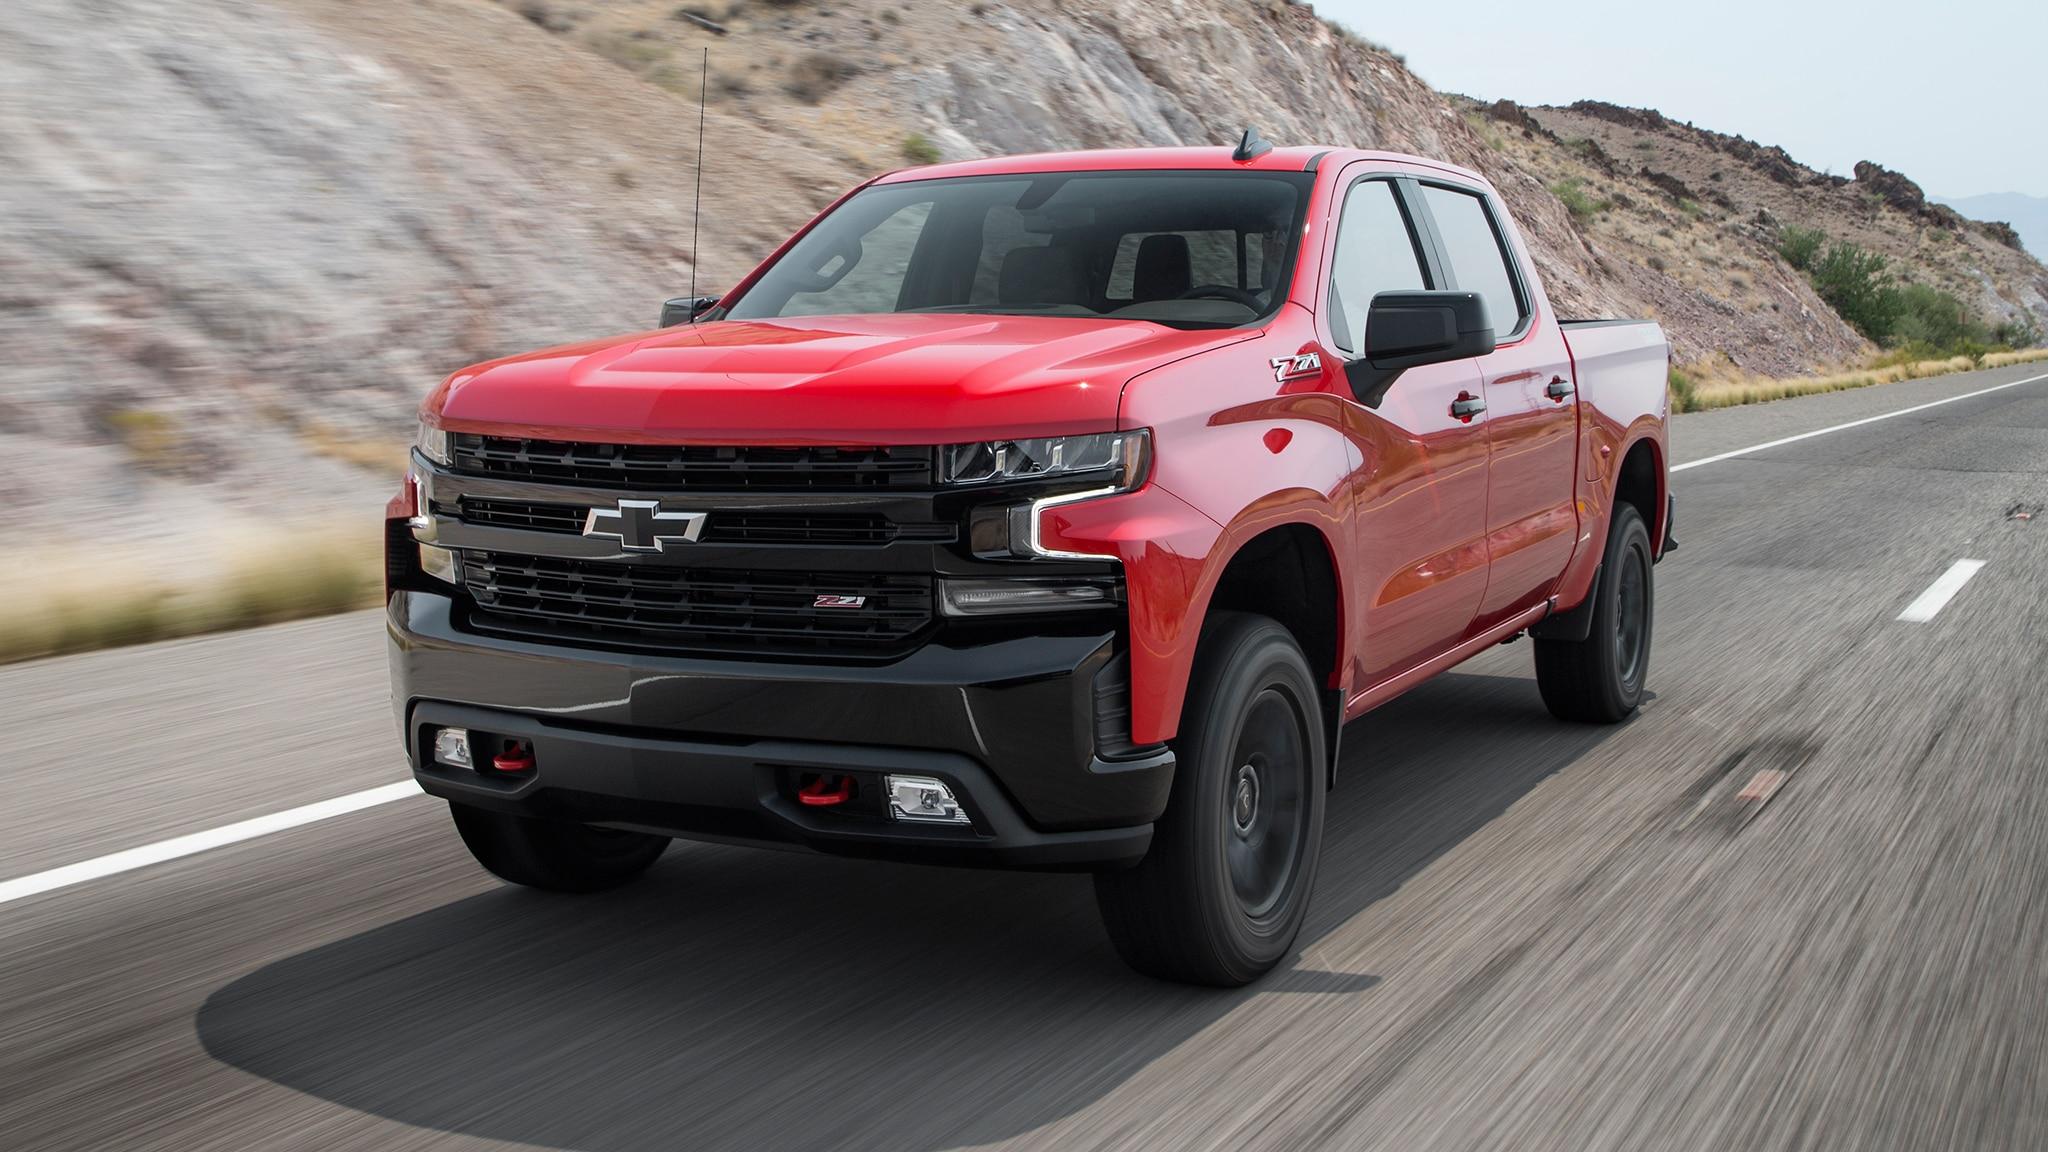 2019 Chevrolet Silverado 4WD Trail Boss Front Three Quarter In Motion